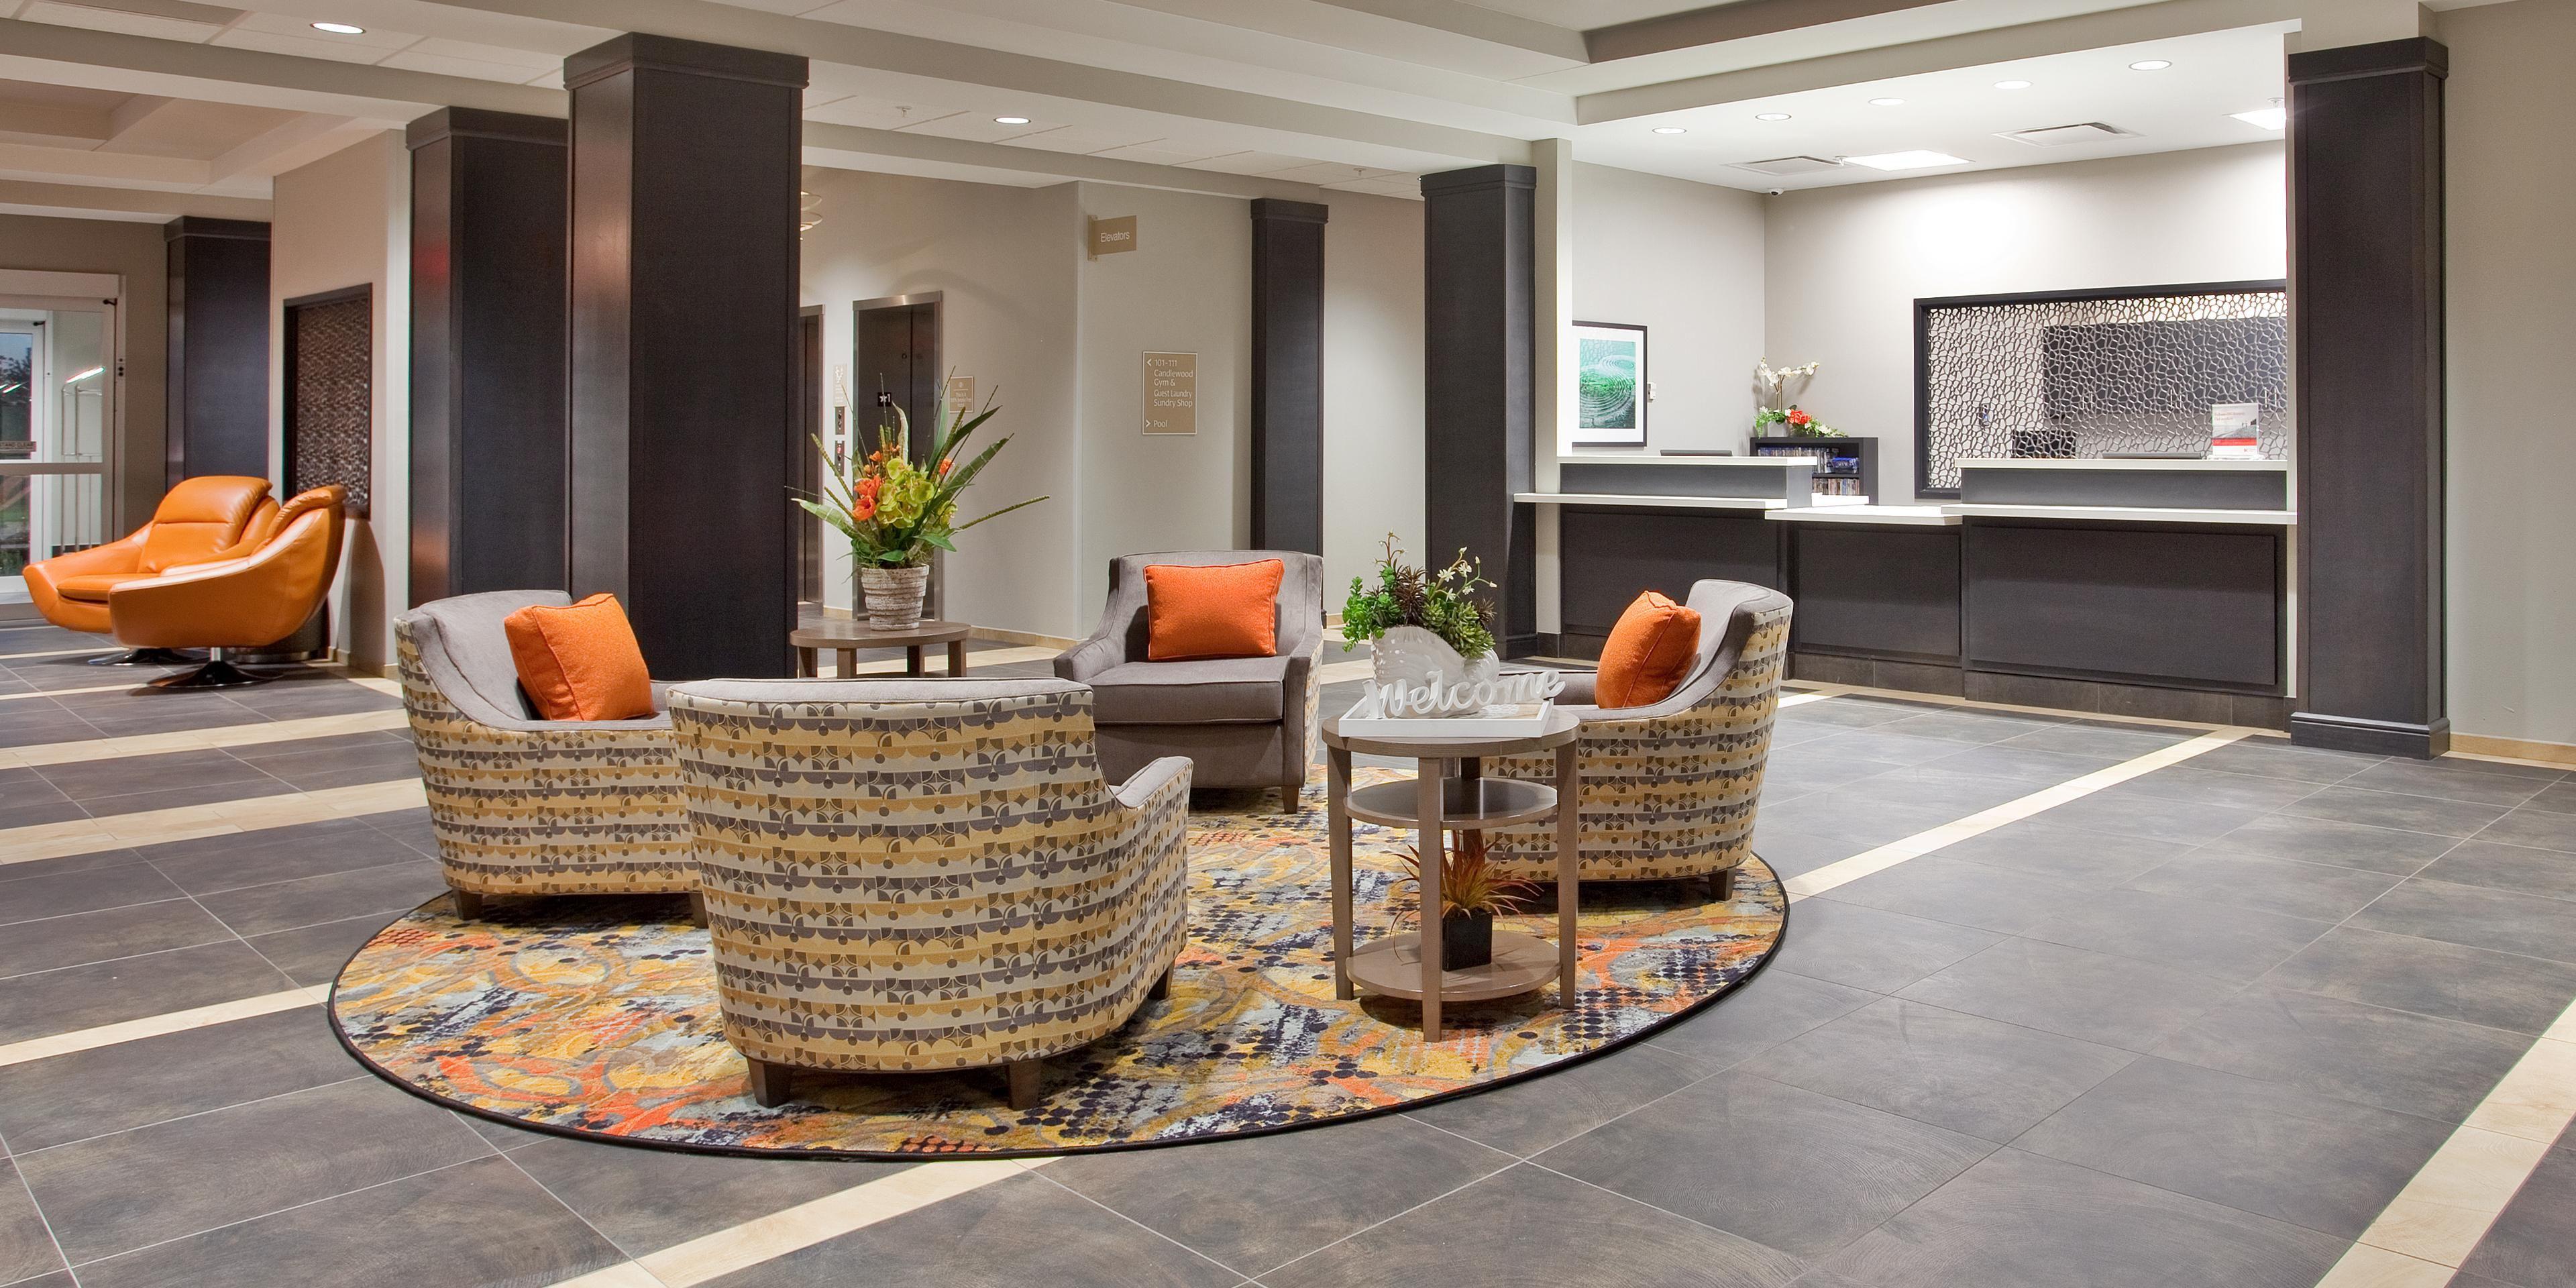 Incroyable ... Extended Stay Hotel In Grand Island, Nebraska ...